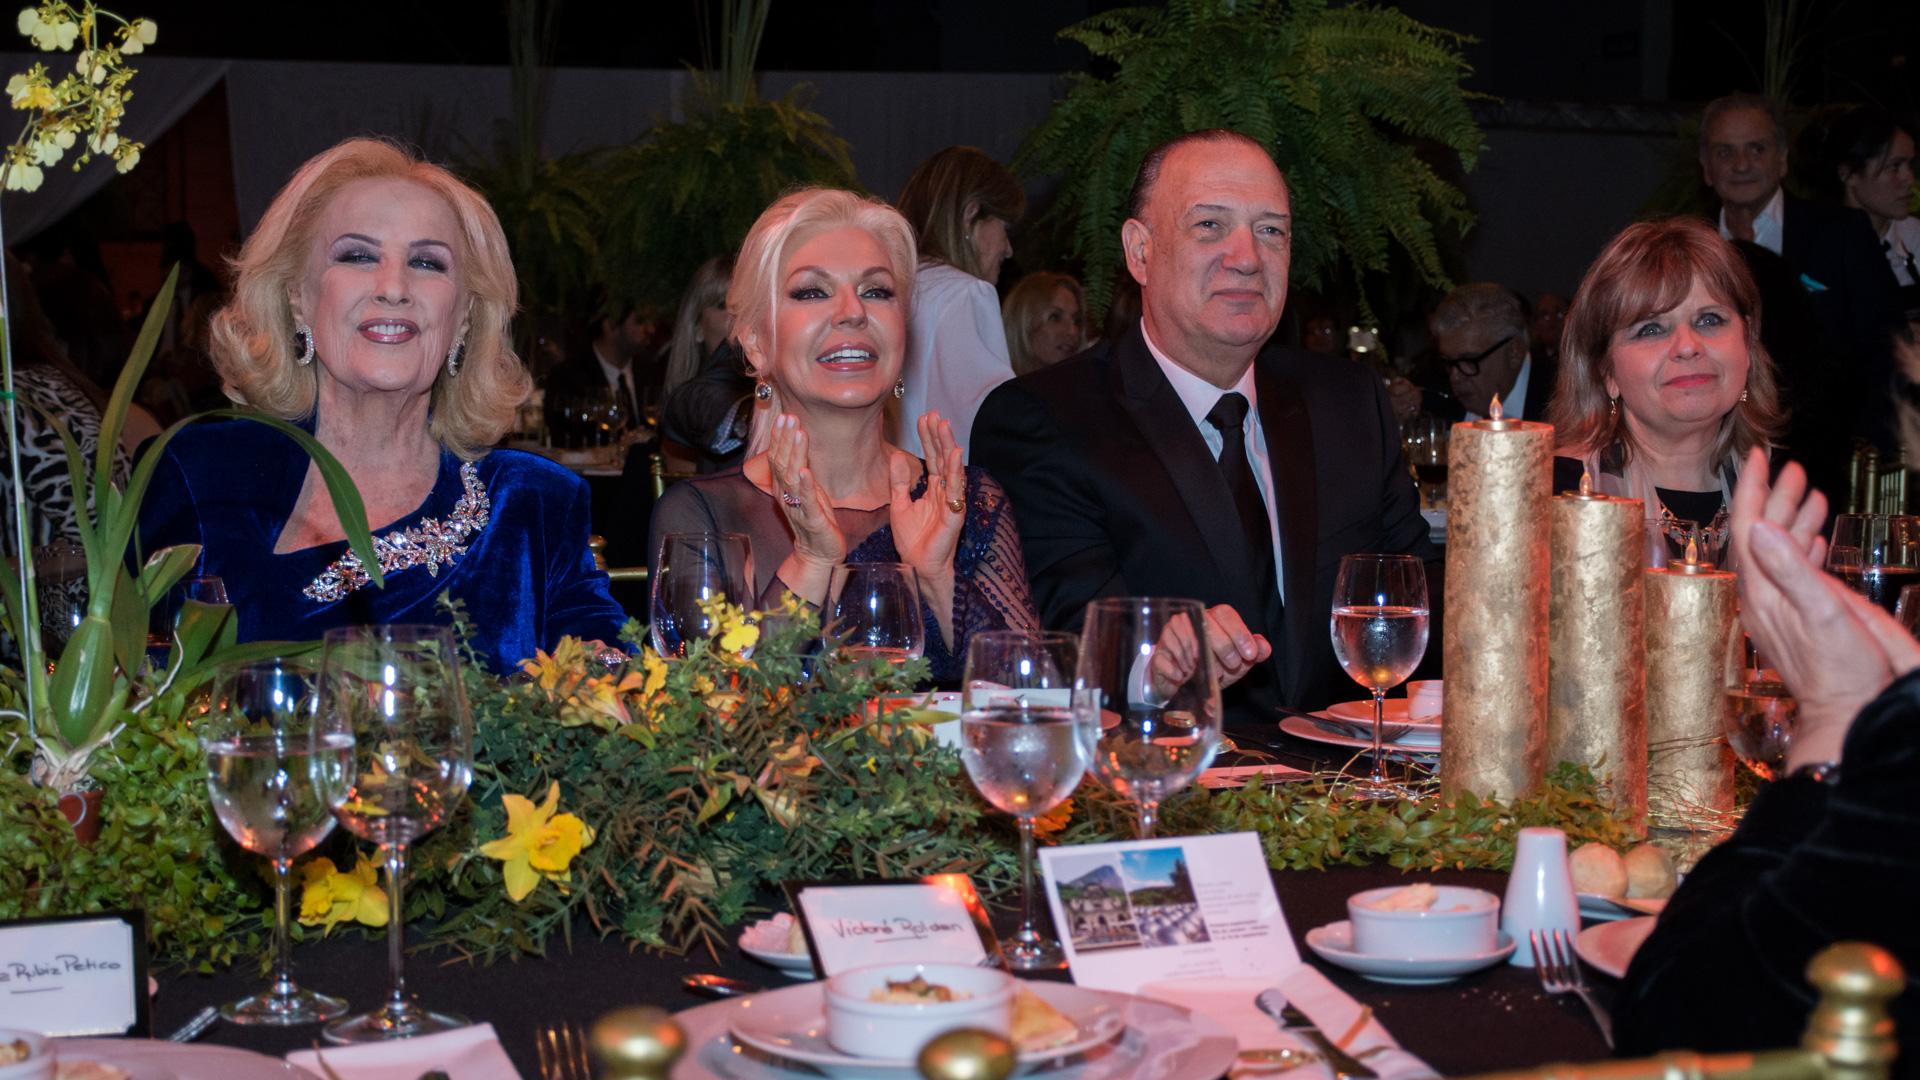 Mirtha Legrand participó de la gala a beneficio del Hospital Rivadavia (Martín Rosenzveig)